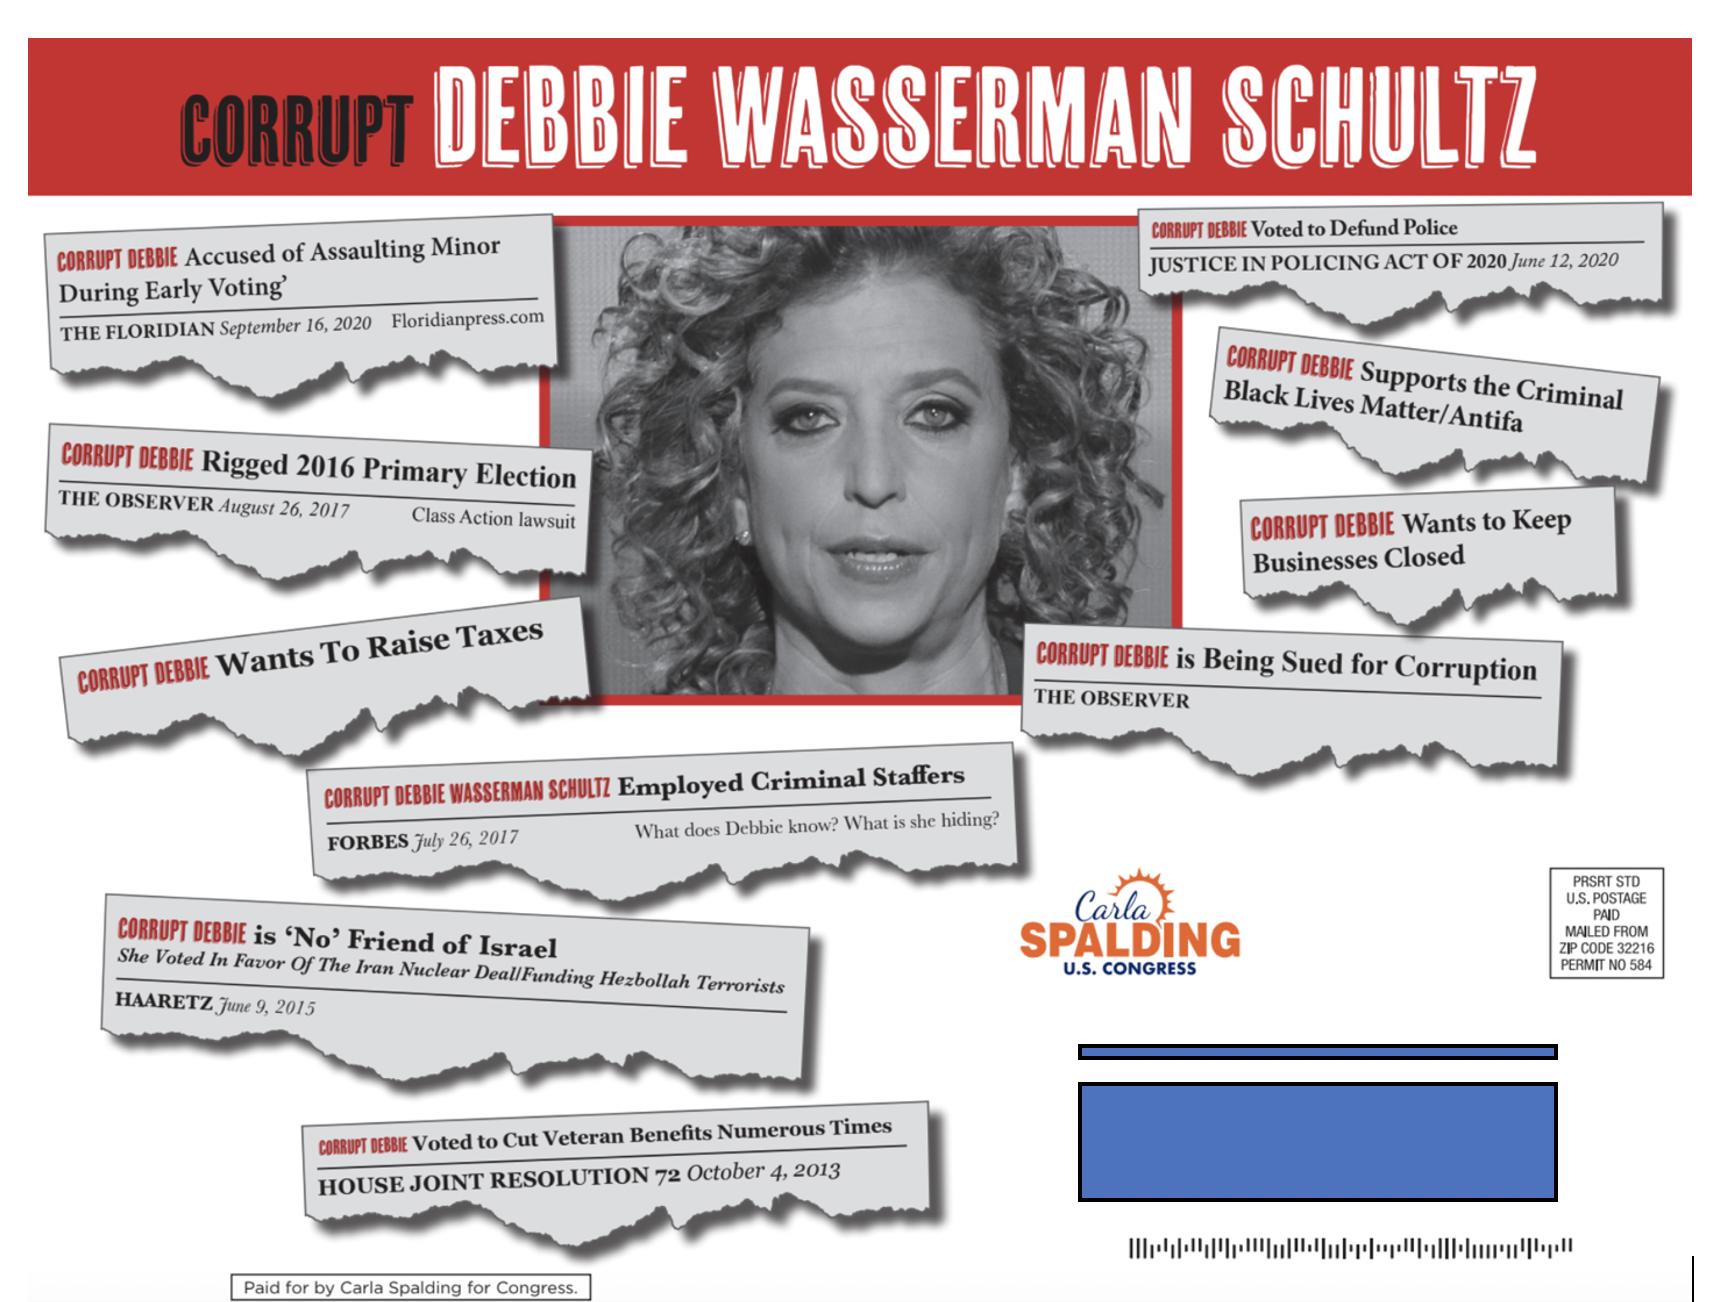 Spalding slams Wasserman Schultz with 'Corrupt Debbie' campaign